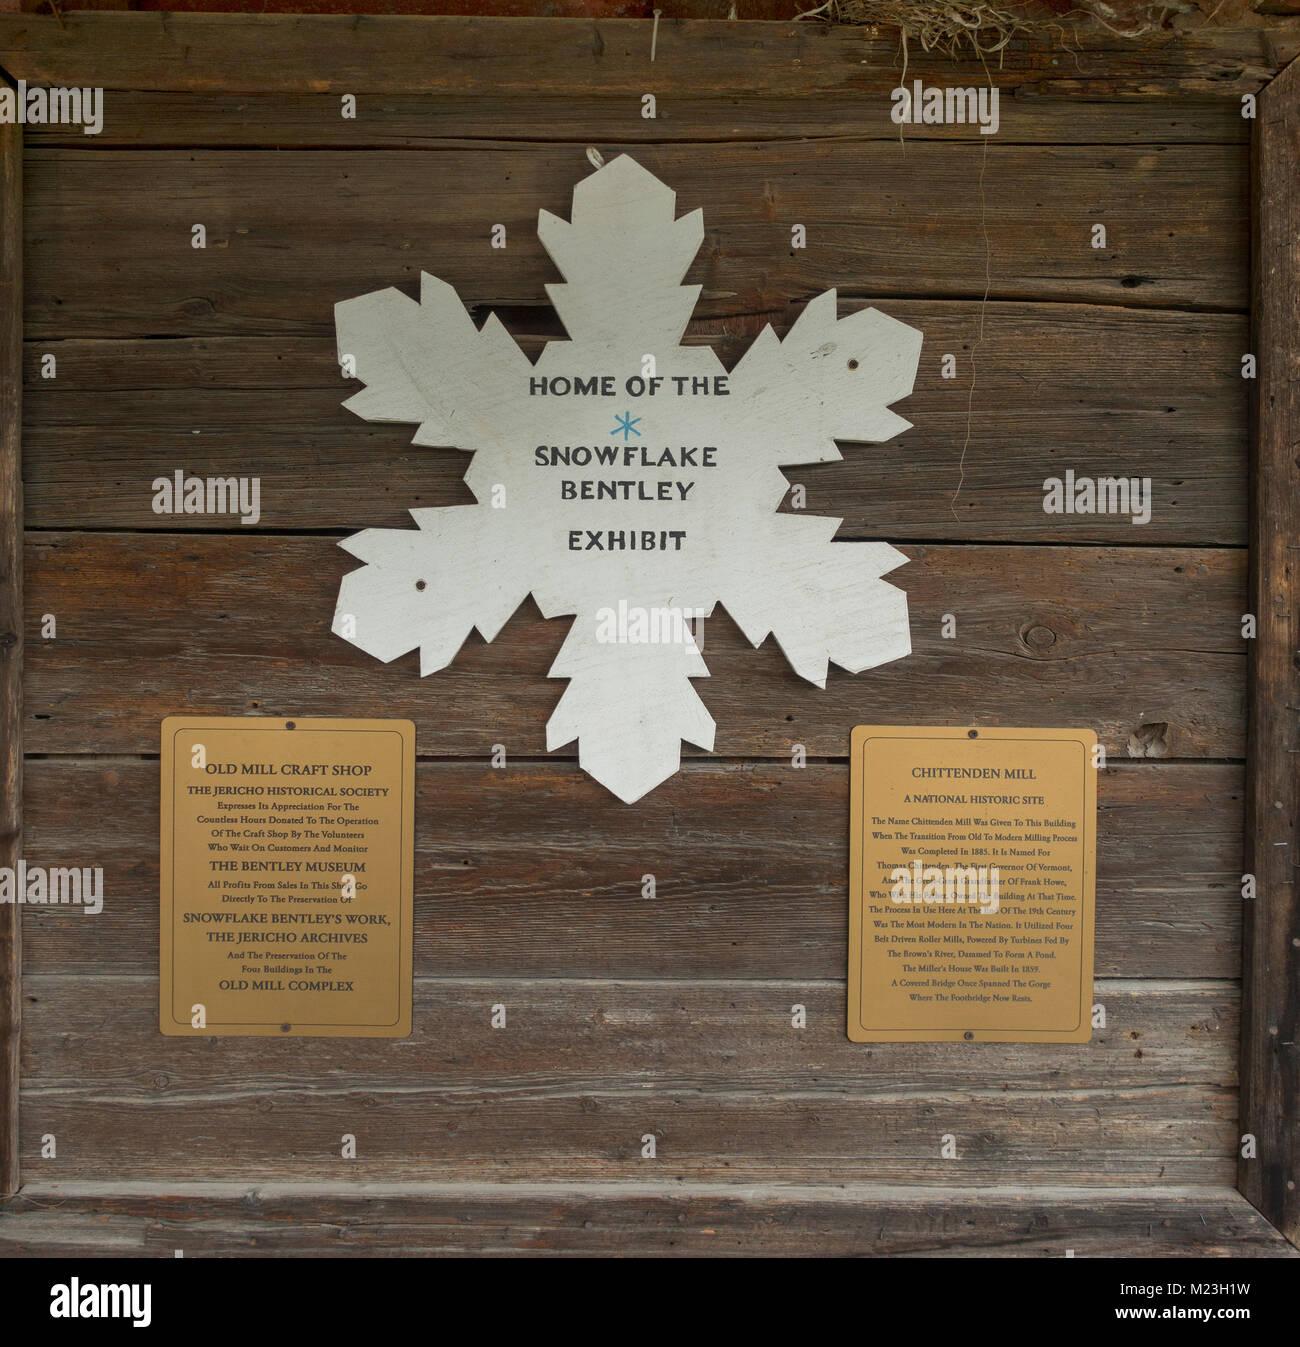 Snowflake Bentley Exhibit at the Jericho Historical Society VT - Stock Image